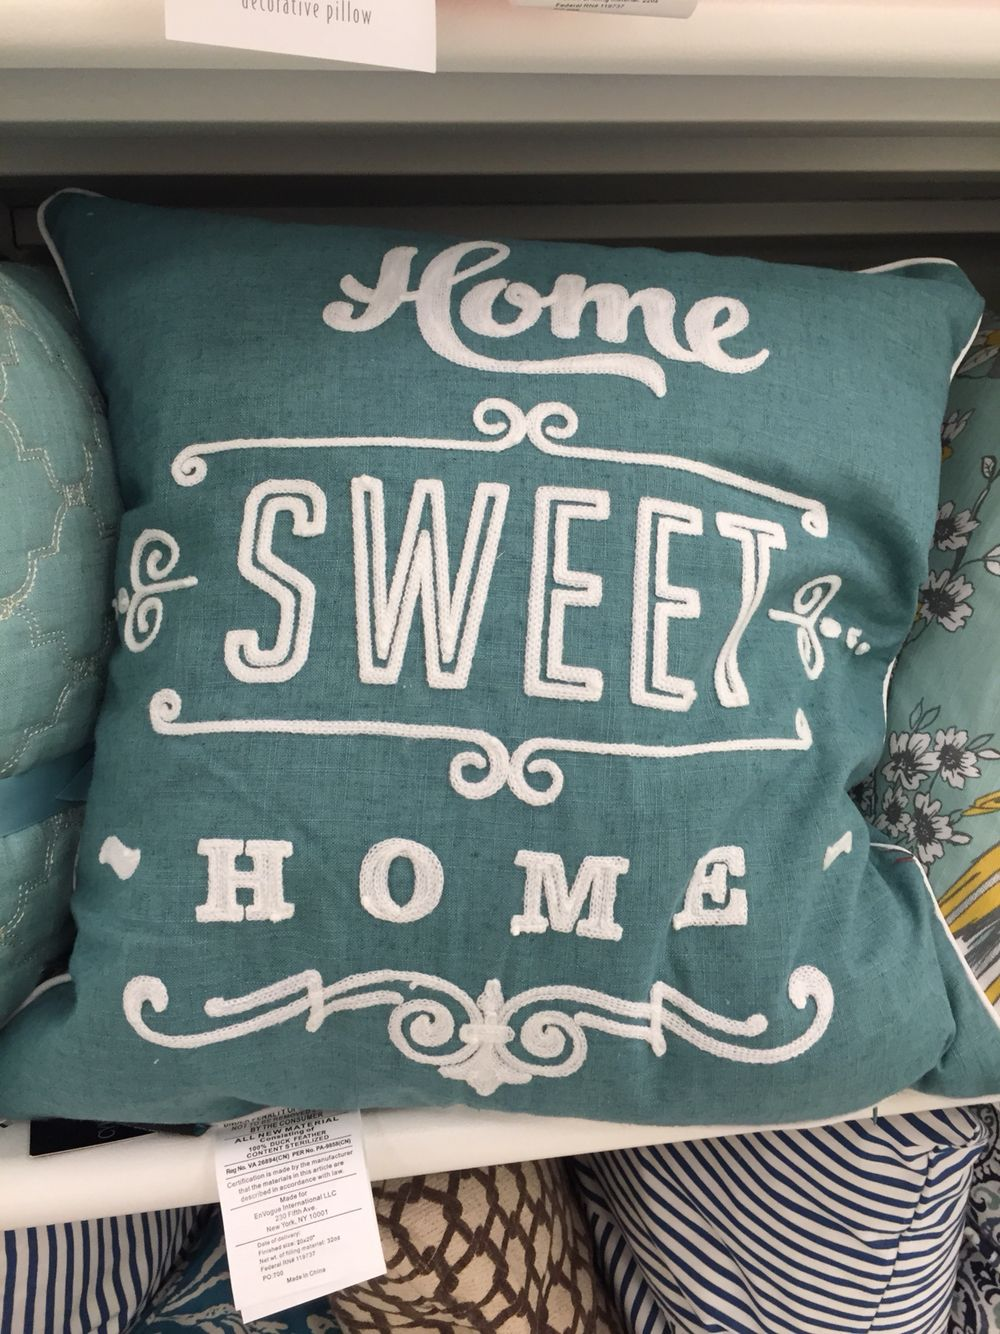 Decretive pillows.